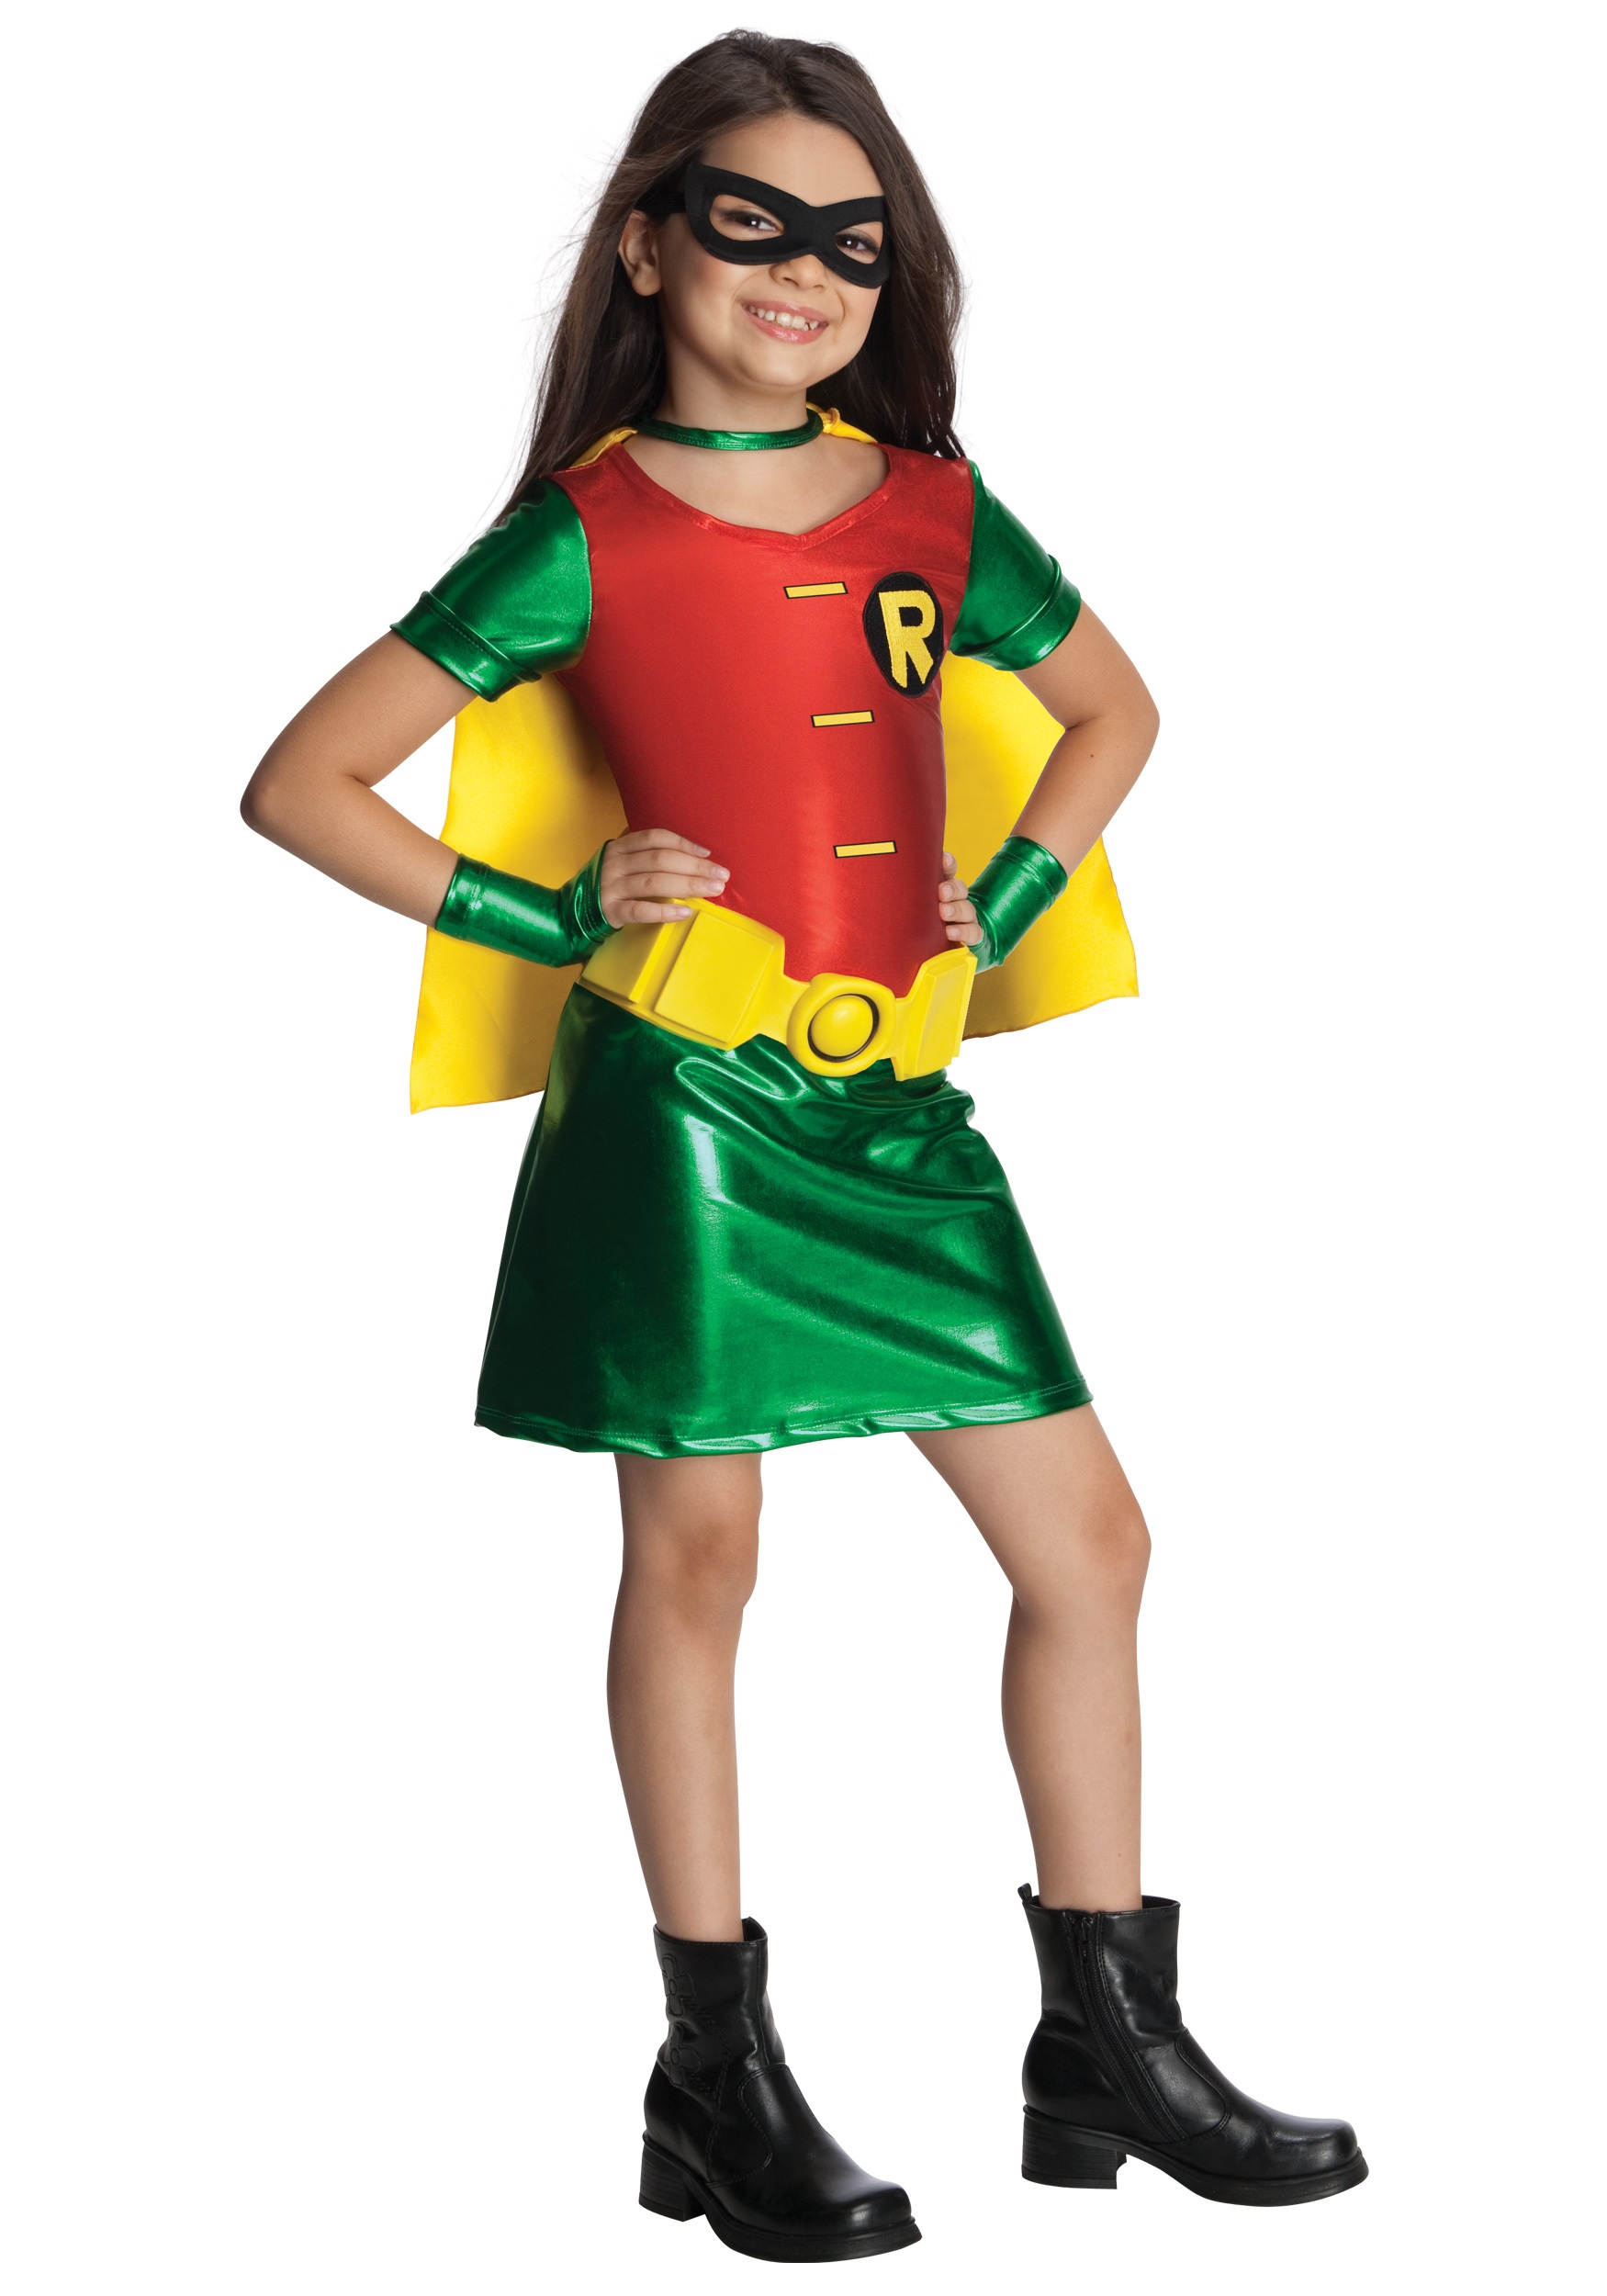 Teen Titans Costumes-Achetez des lots Petit Prix Teen